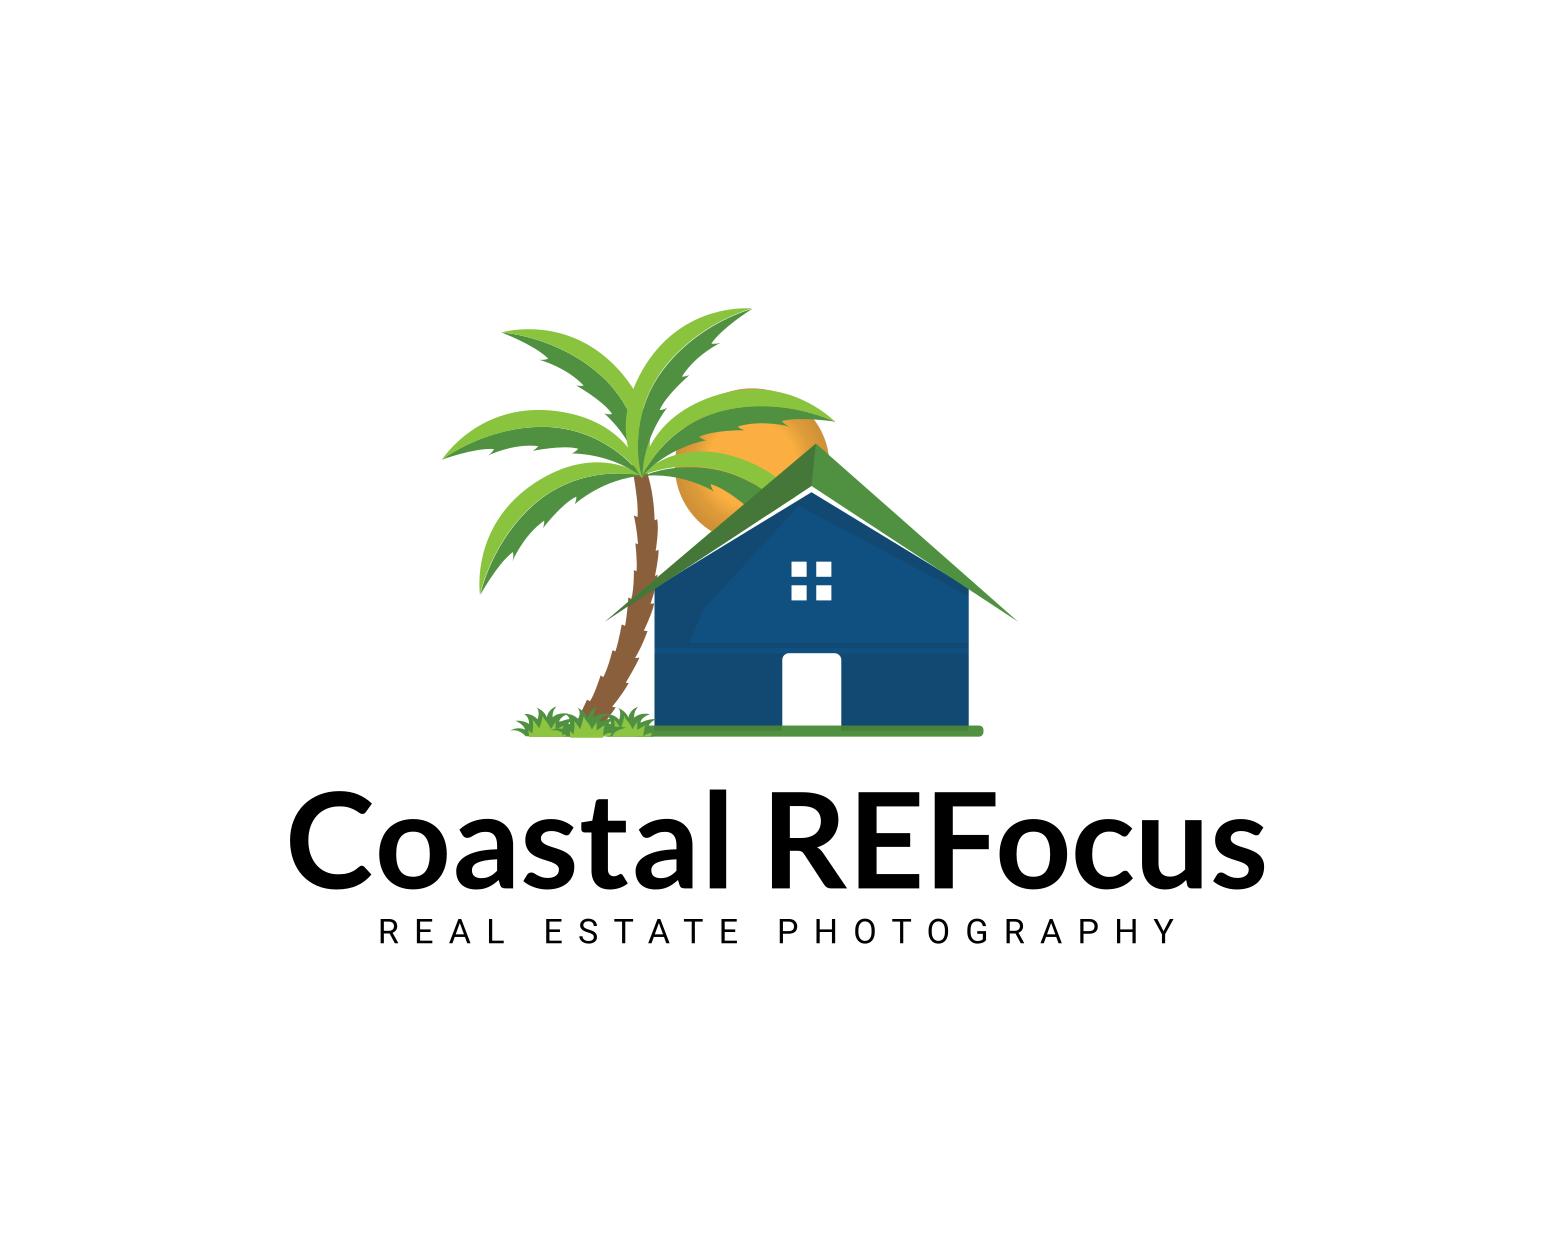 Coastal REFocus floor plan in Garden City Beach Murrells Inlet Myrtle Beach Pawleys Island Surfside Beach